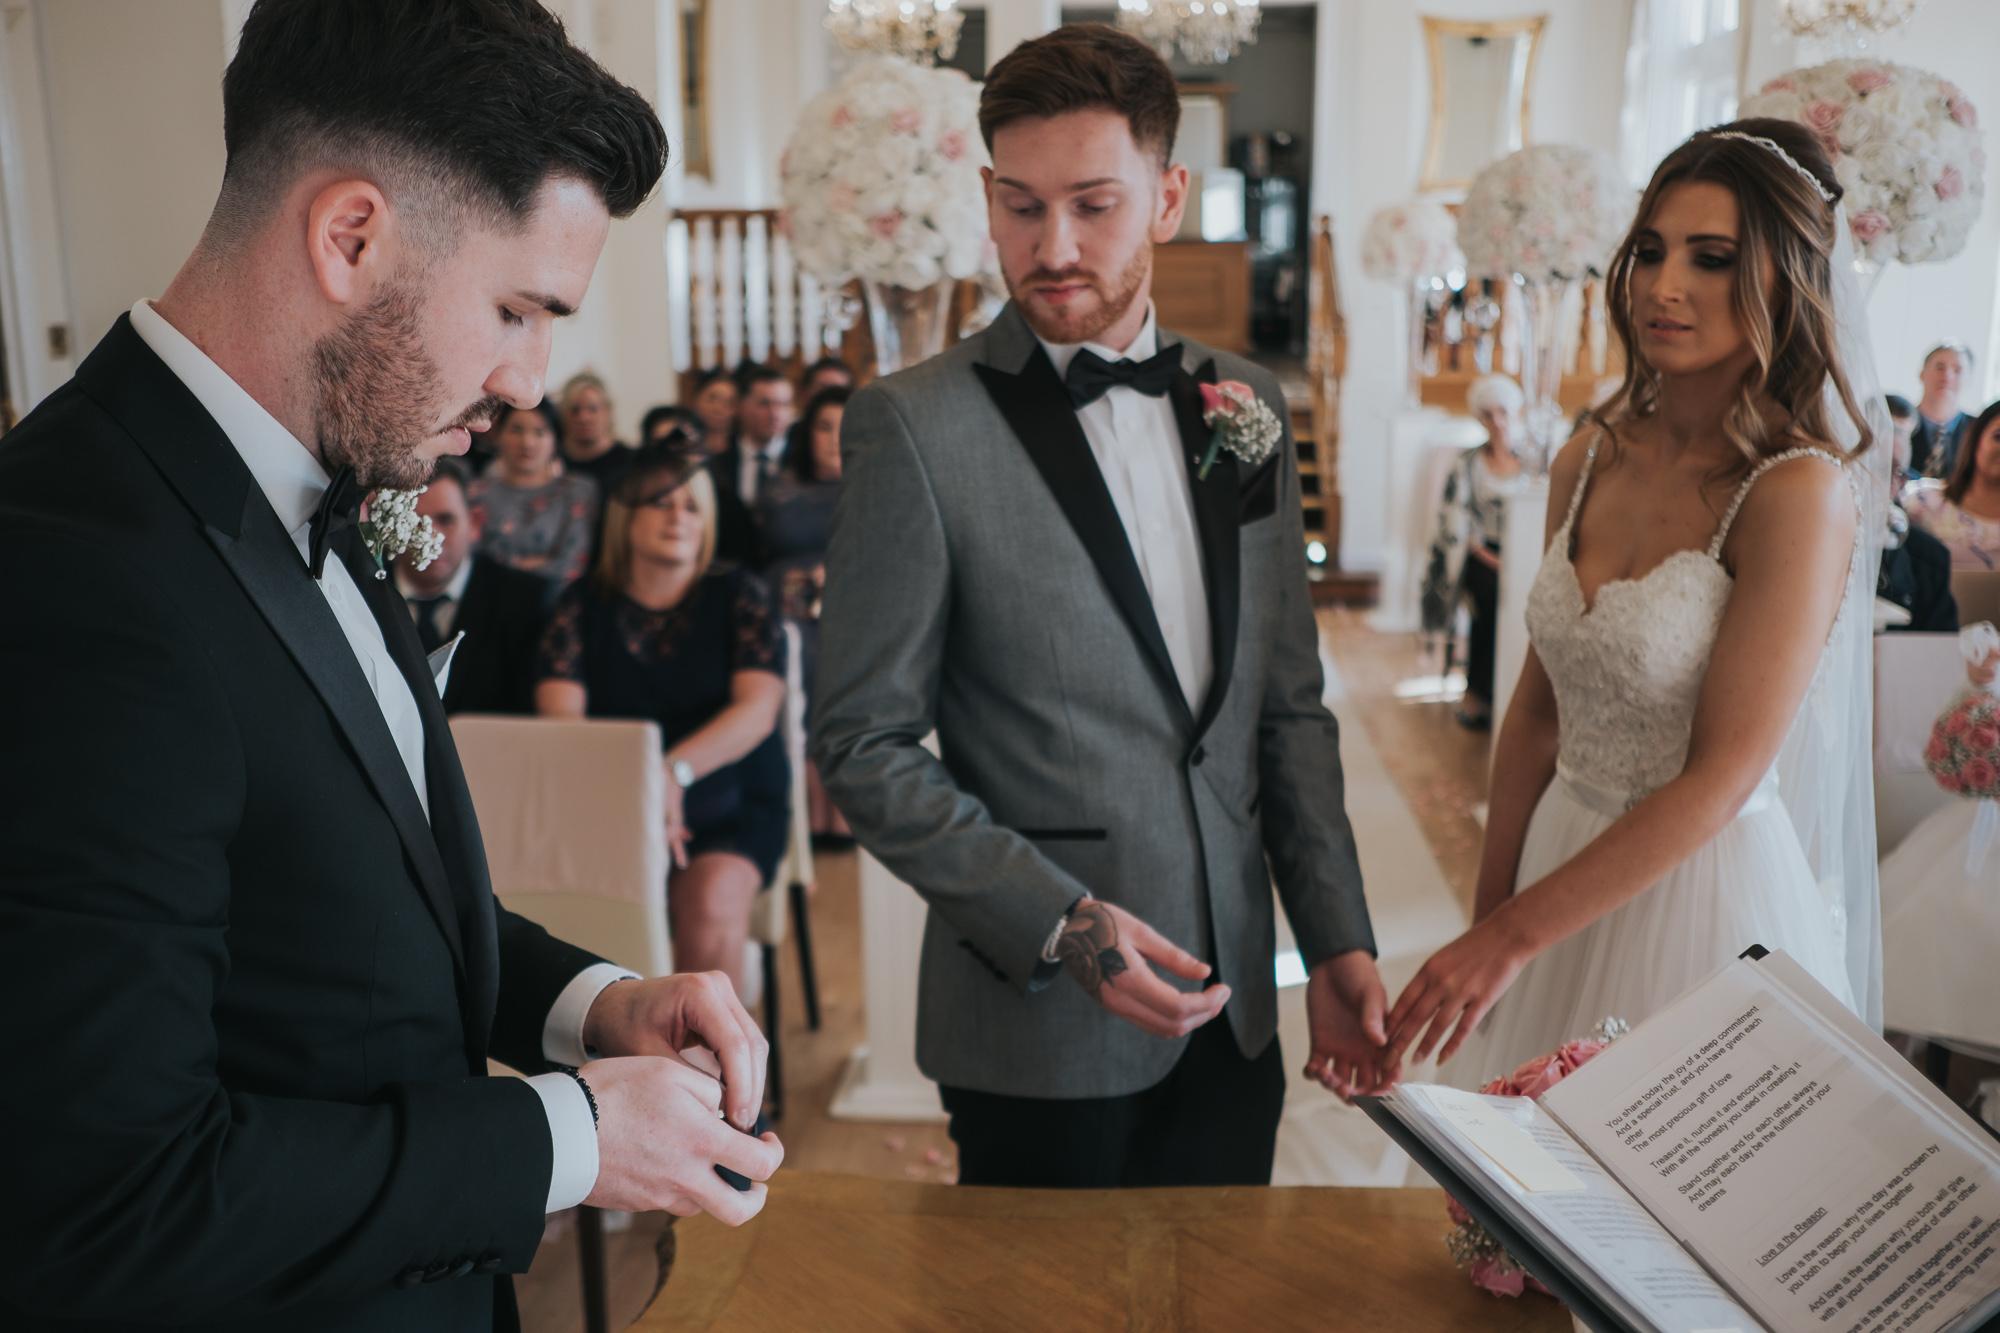 West Tower Exclusive Wedding Venue wedding photography merseyside and lancashire wedding photographer (26 of 60).jpg